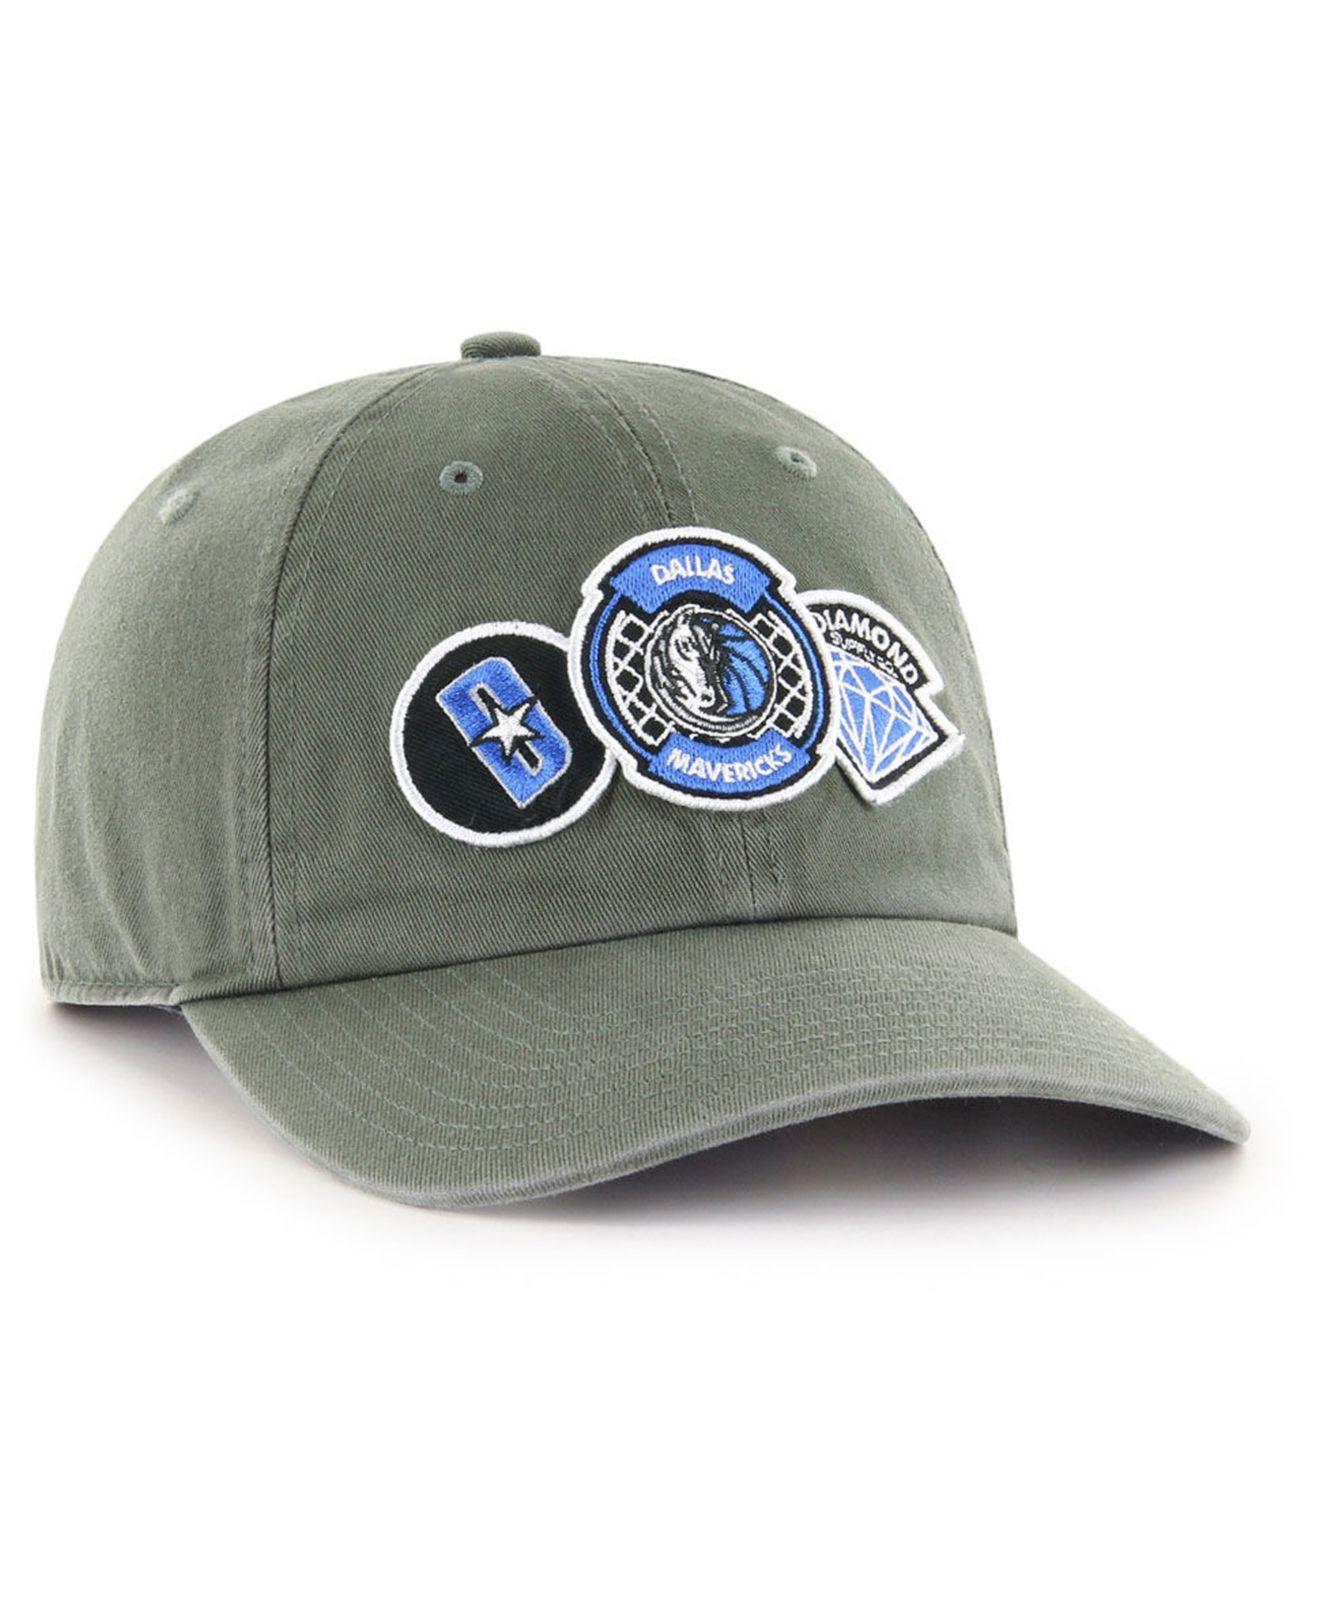 Lyst - 47 Brand Dallas Mavericks Diamond Patch Clean Up Mf Cap for Men c14cd916a98